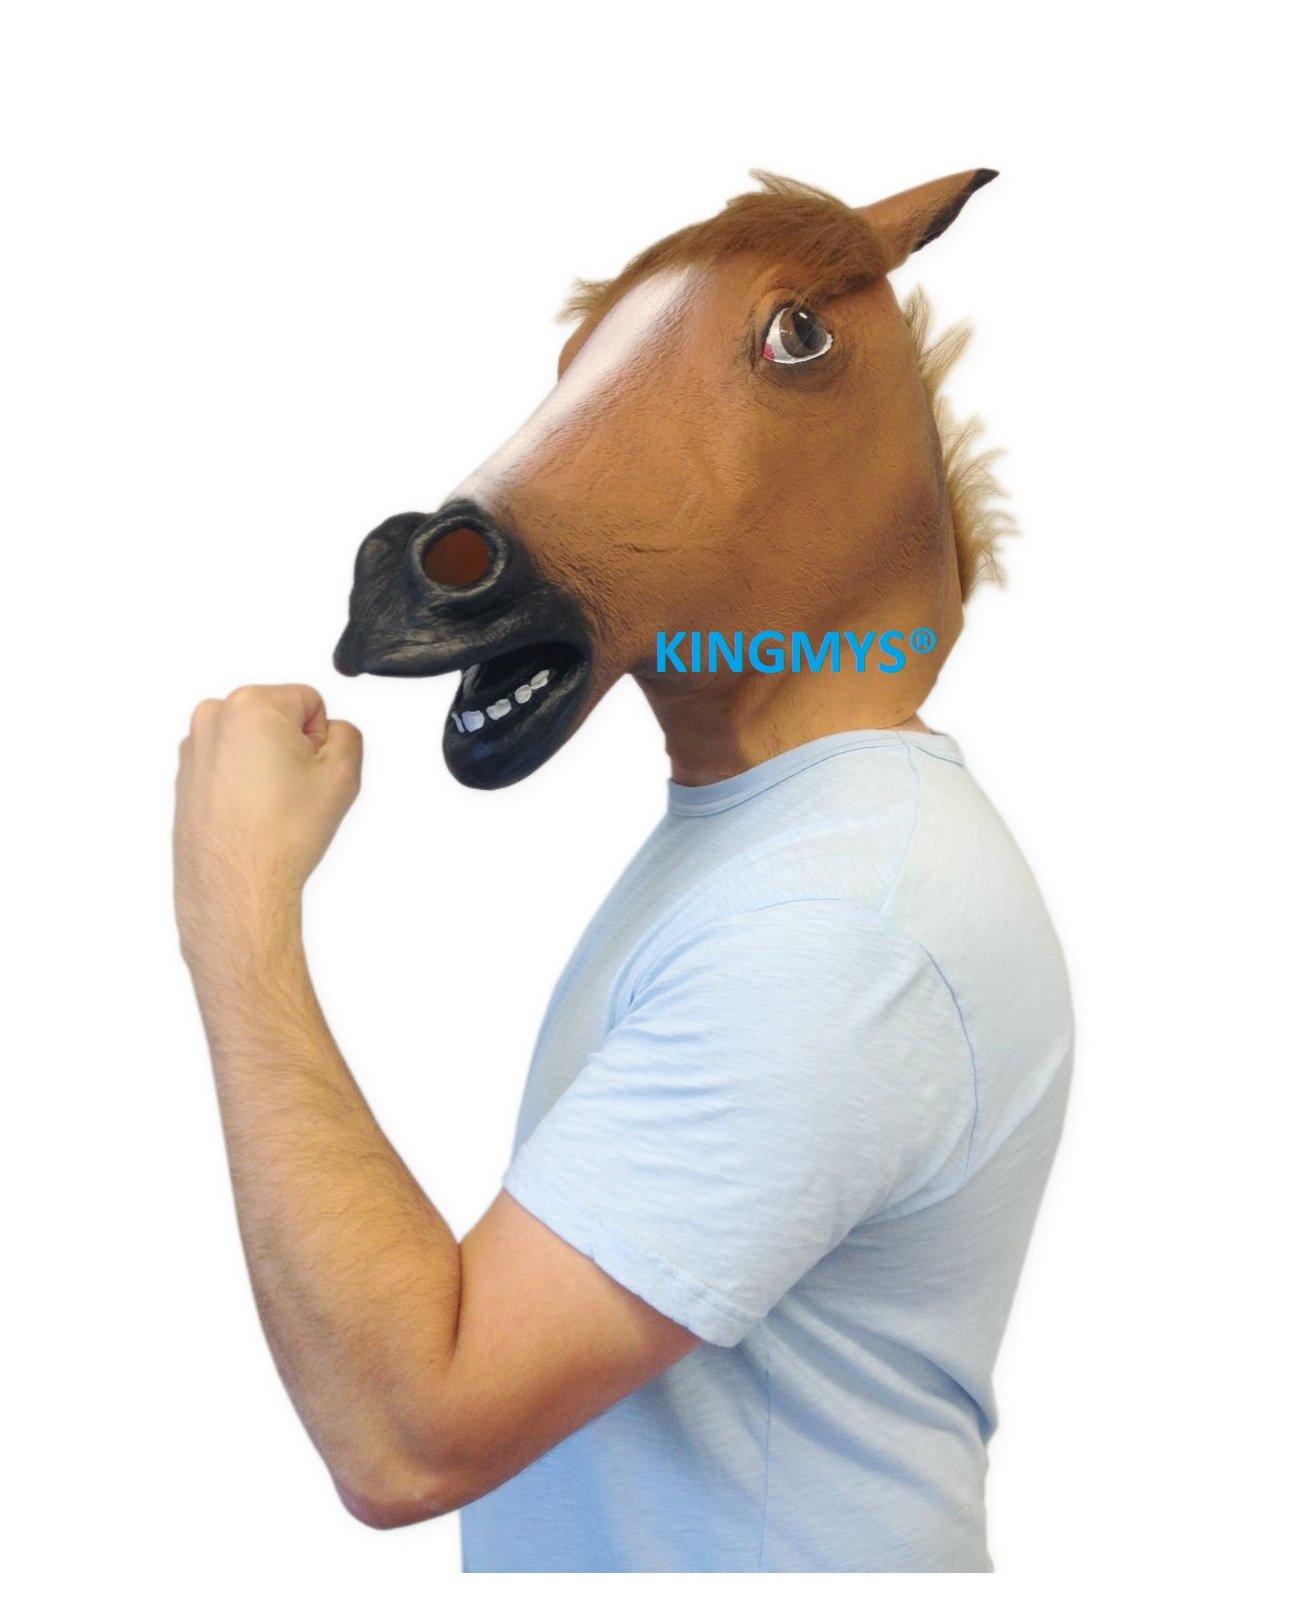 Kingmys@ Novelty Creepy Horse Halloween Mask Extremely Funny Jokes ...